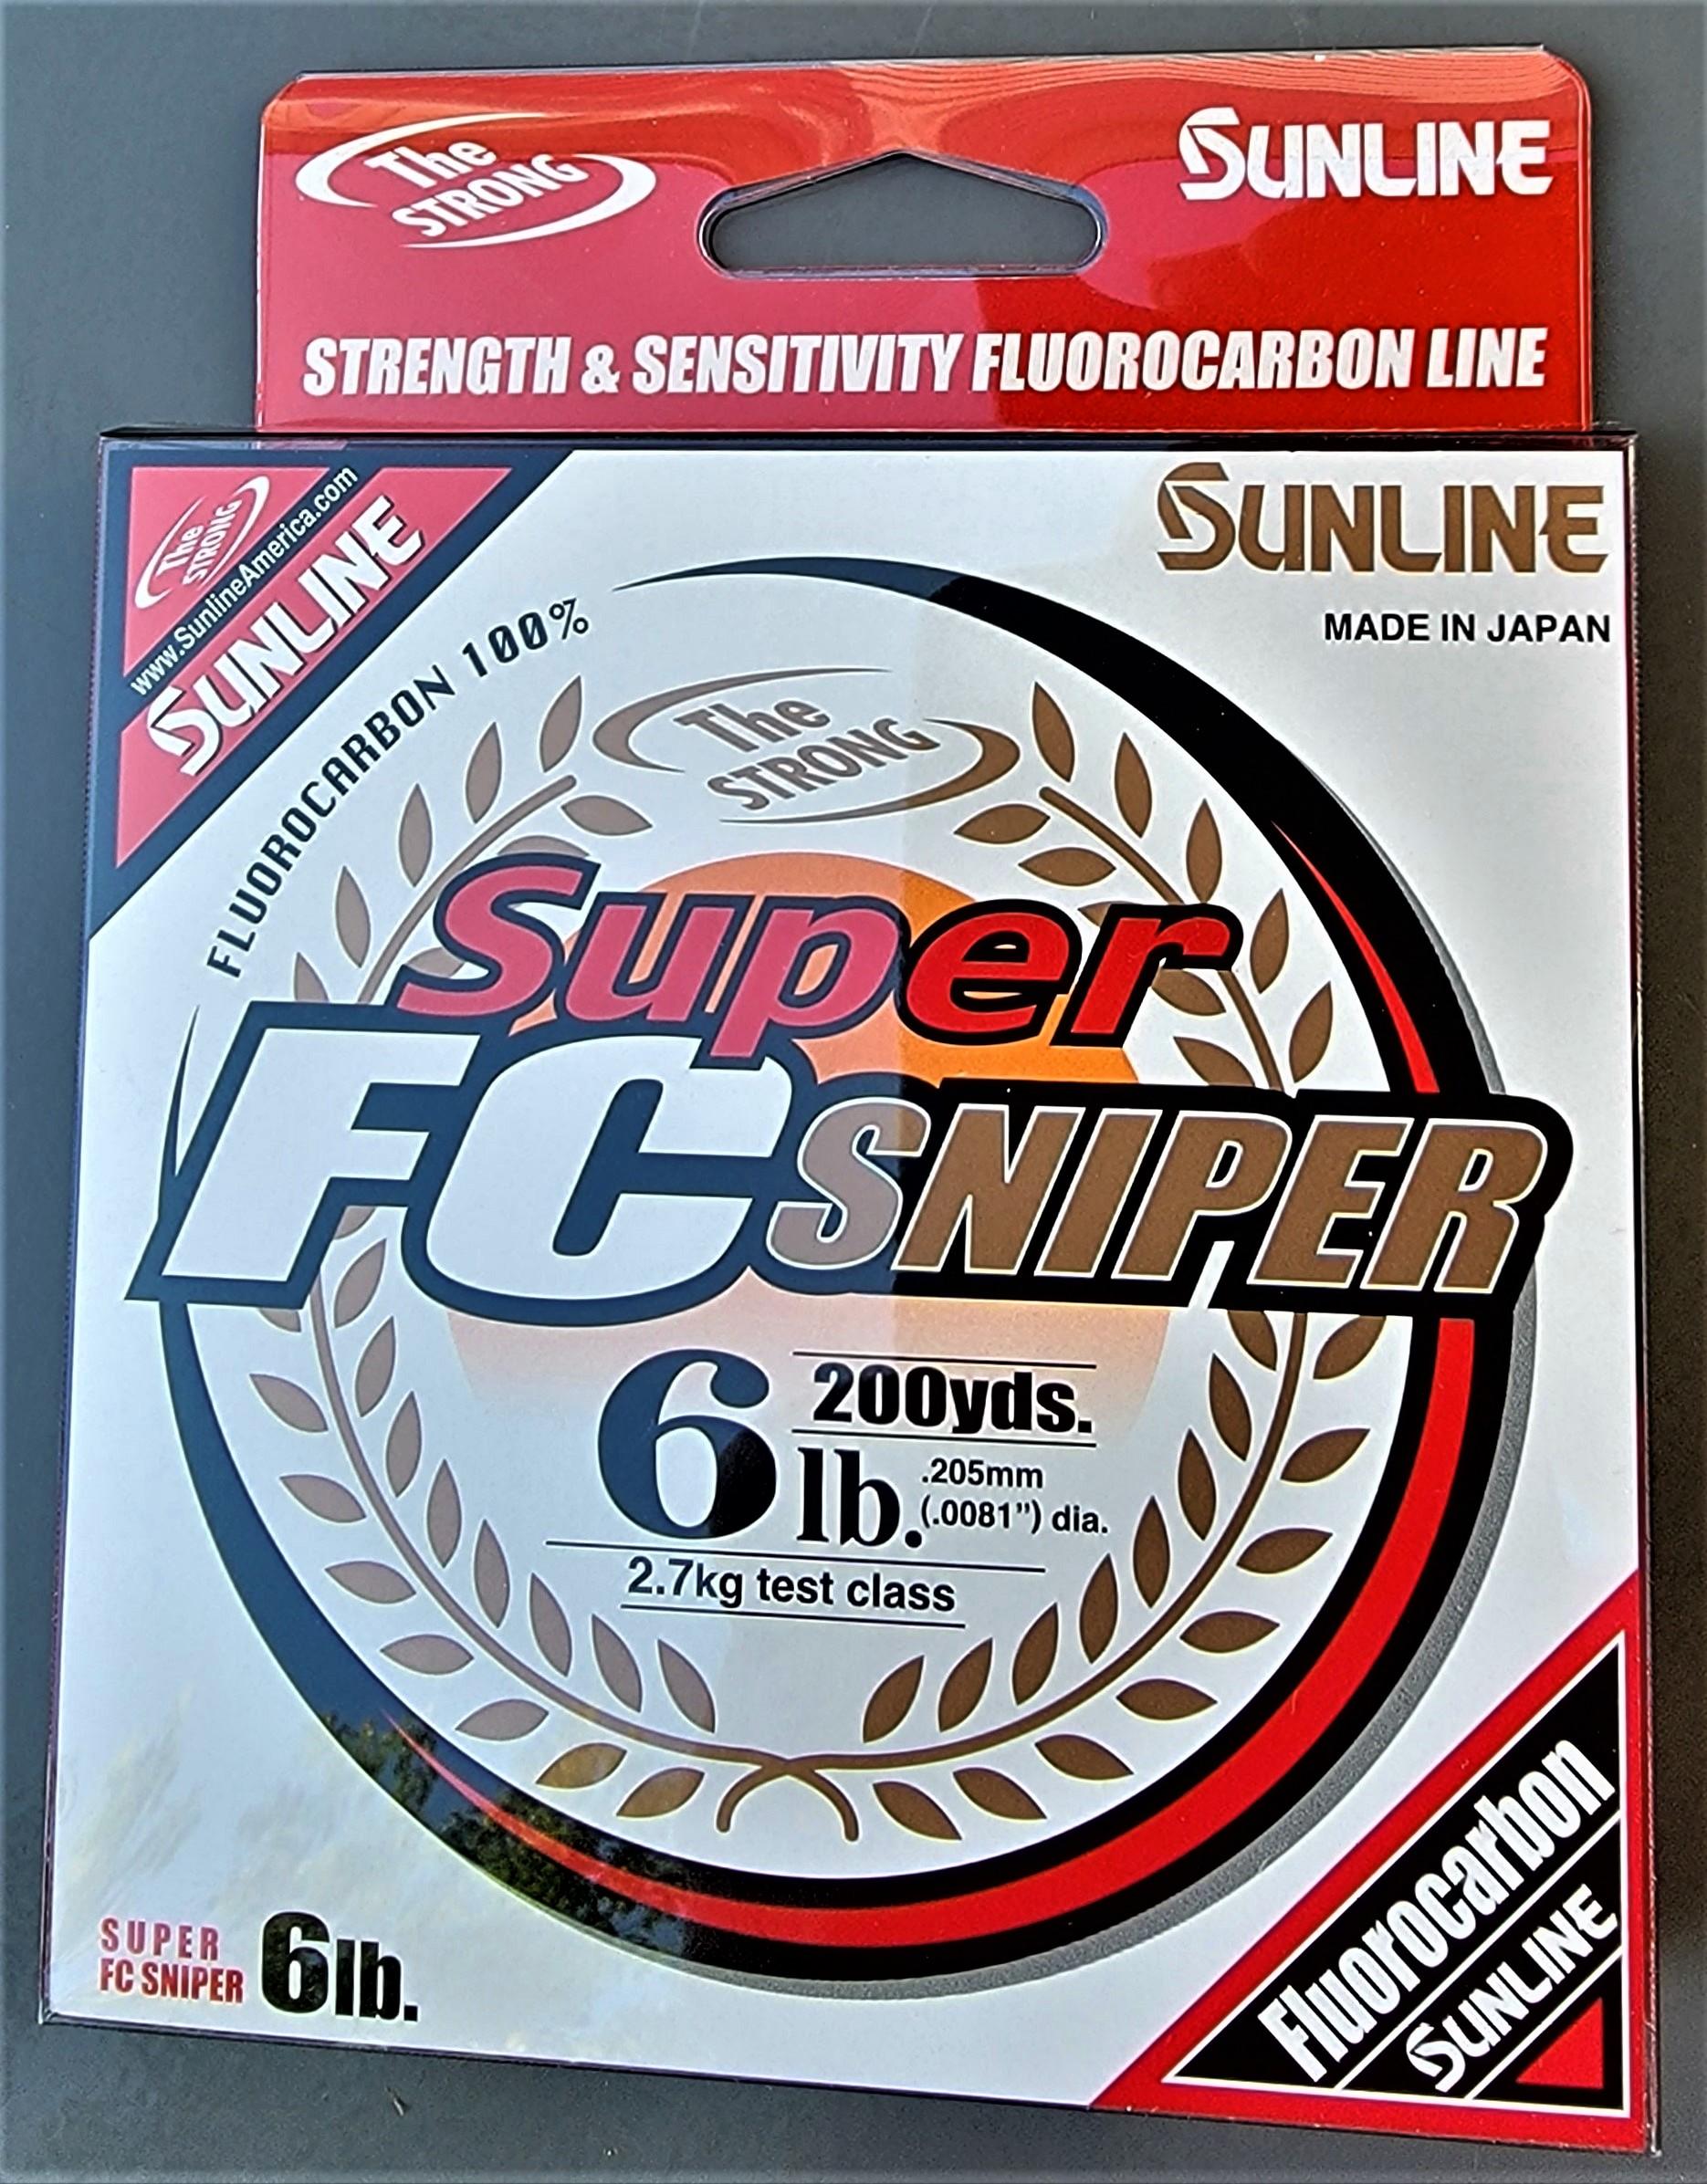 Sunline - Super FC Sniper - 200 YD - Super FC Sniper - 6 LB - Natural Clear